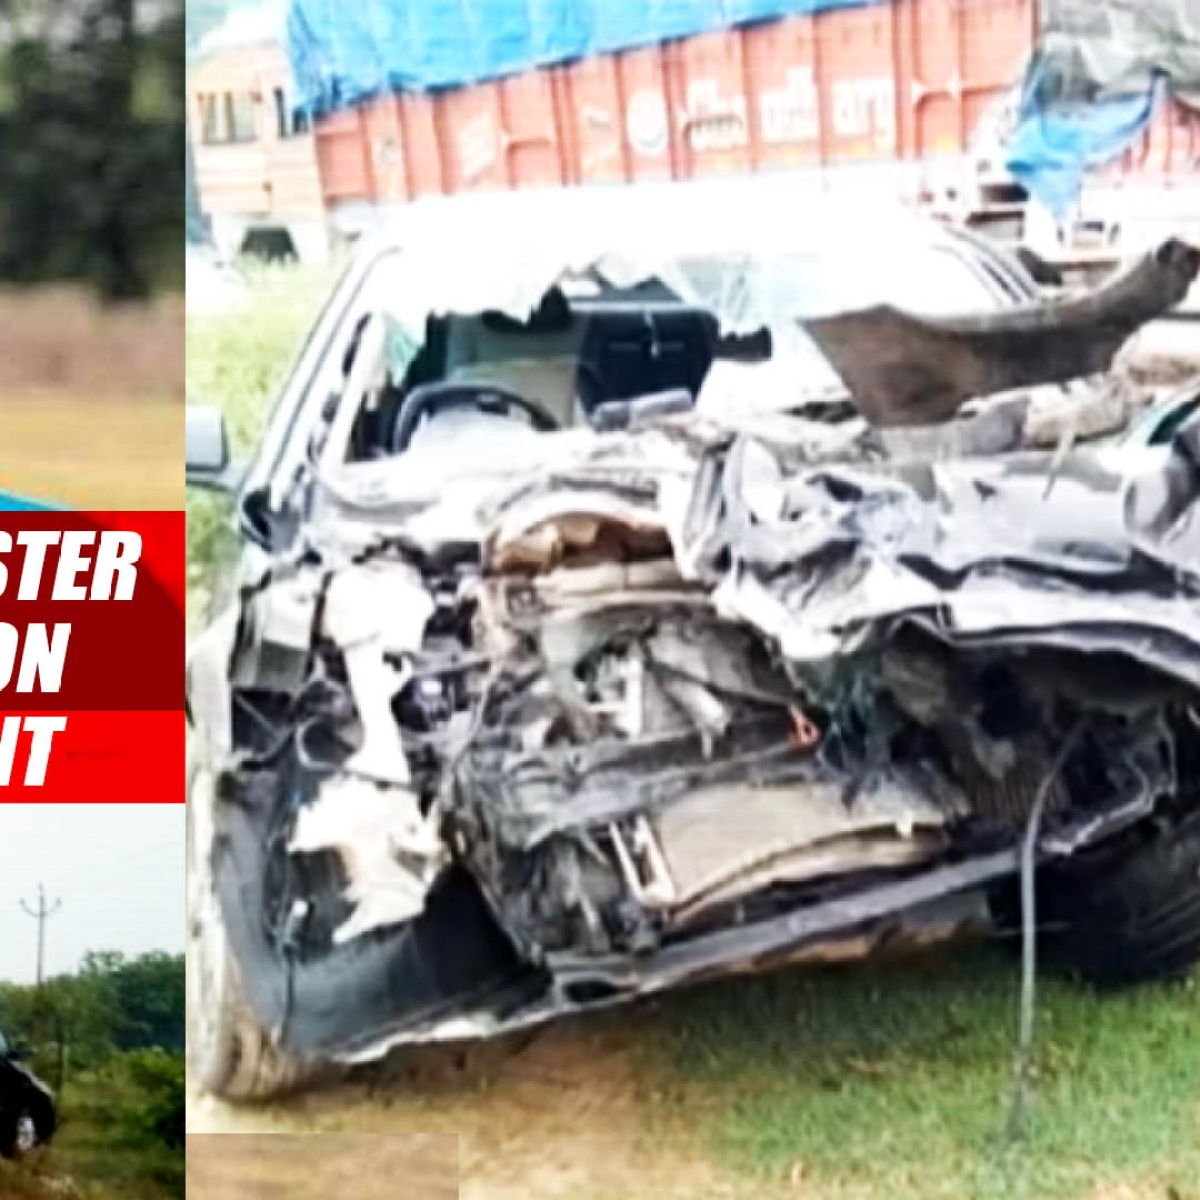 Uttarakhand Minister Arvind Pandey's Son Dies In Car Accident